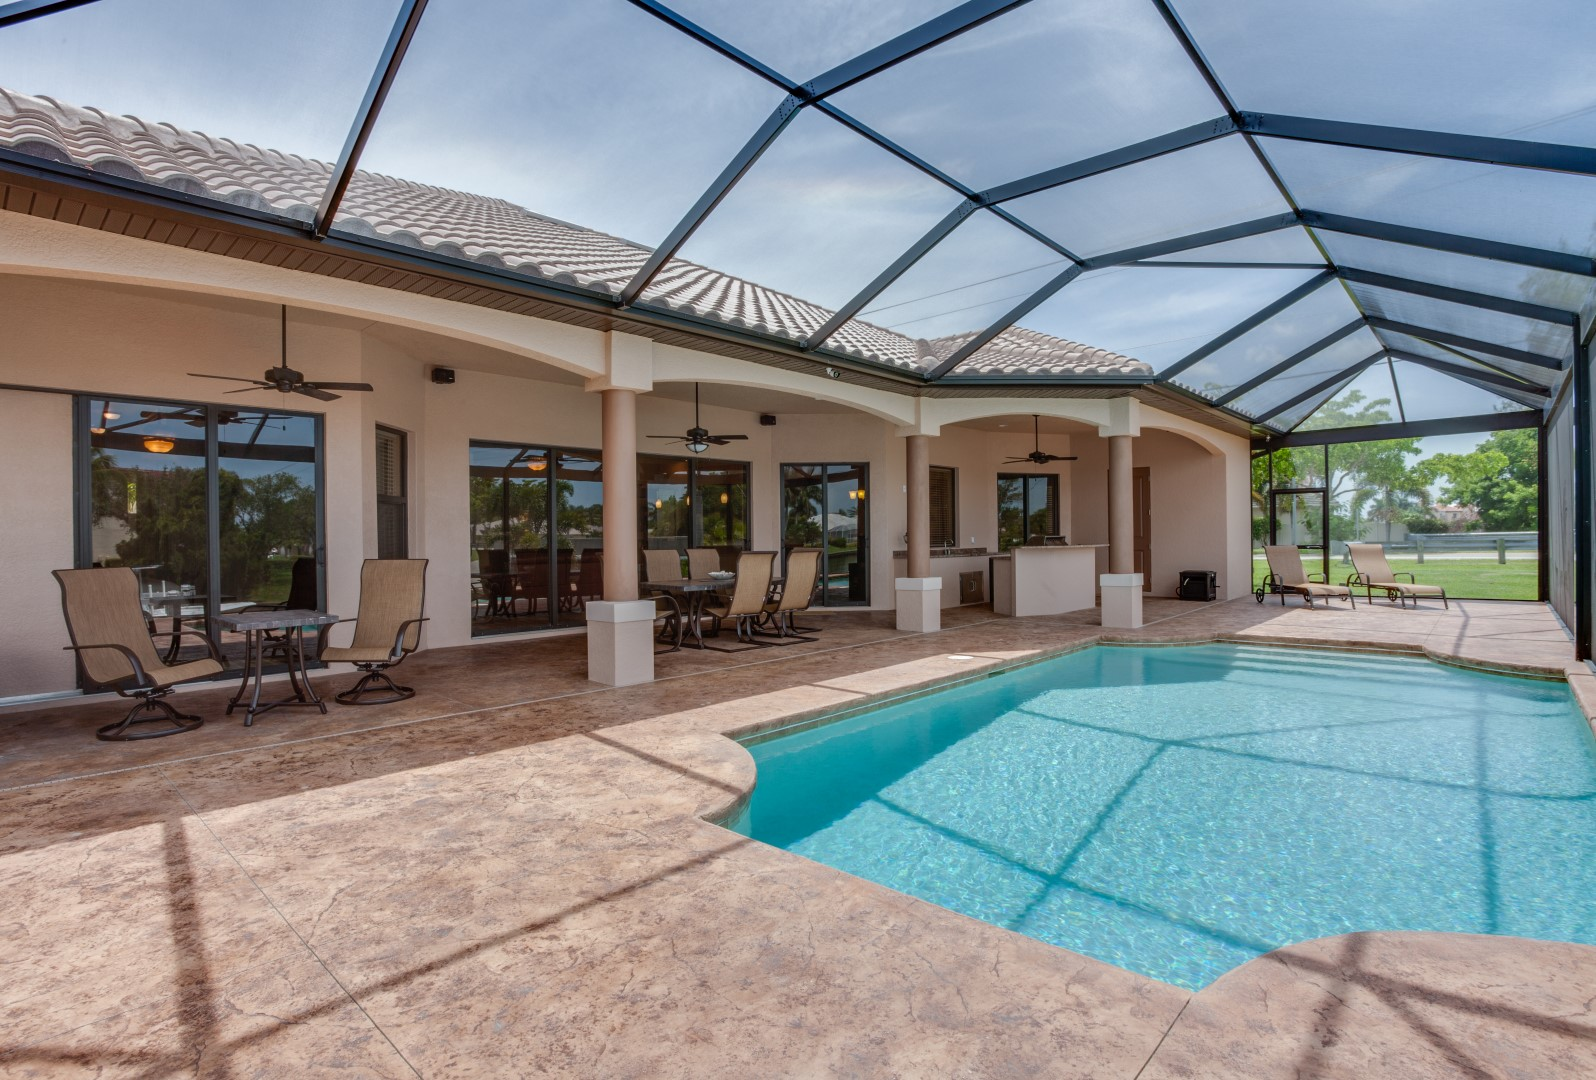 Pool outside patio large sinclair custom homes inc - Houses large patios ...